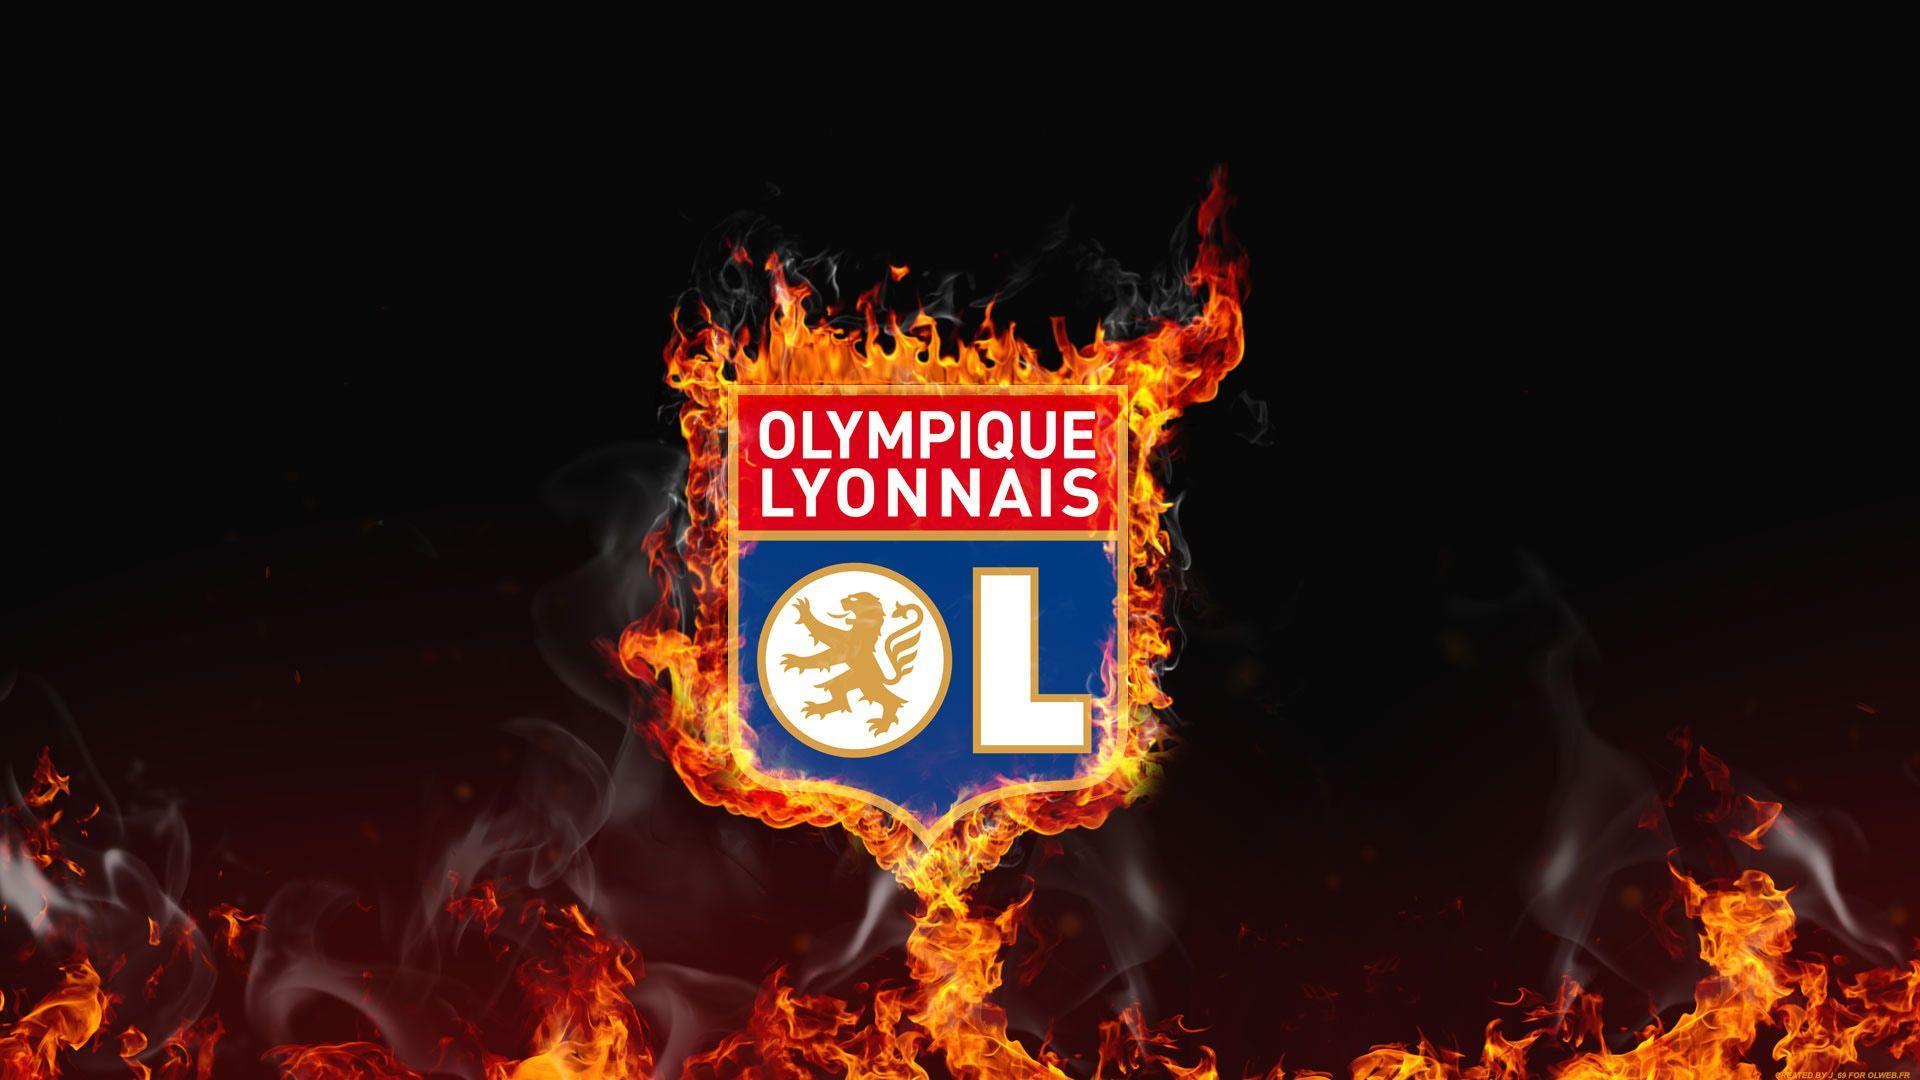 Olympique Lyonnais Teams Background 4